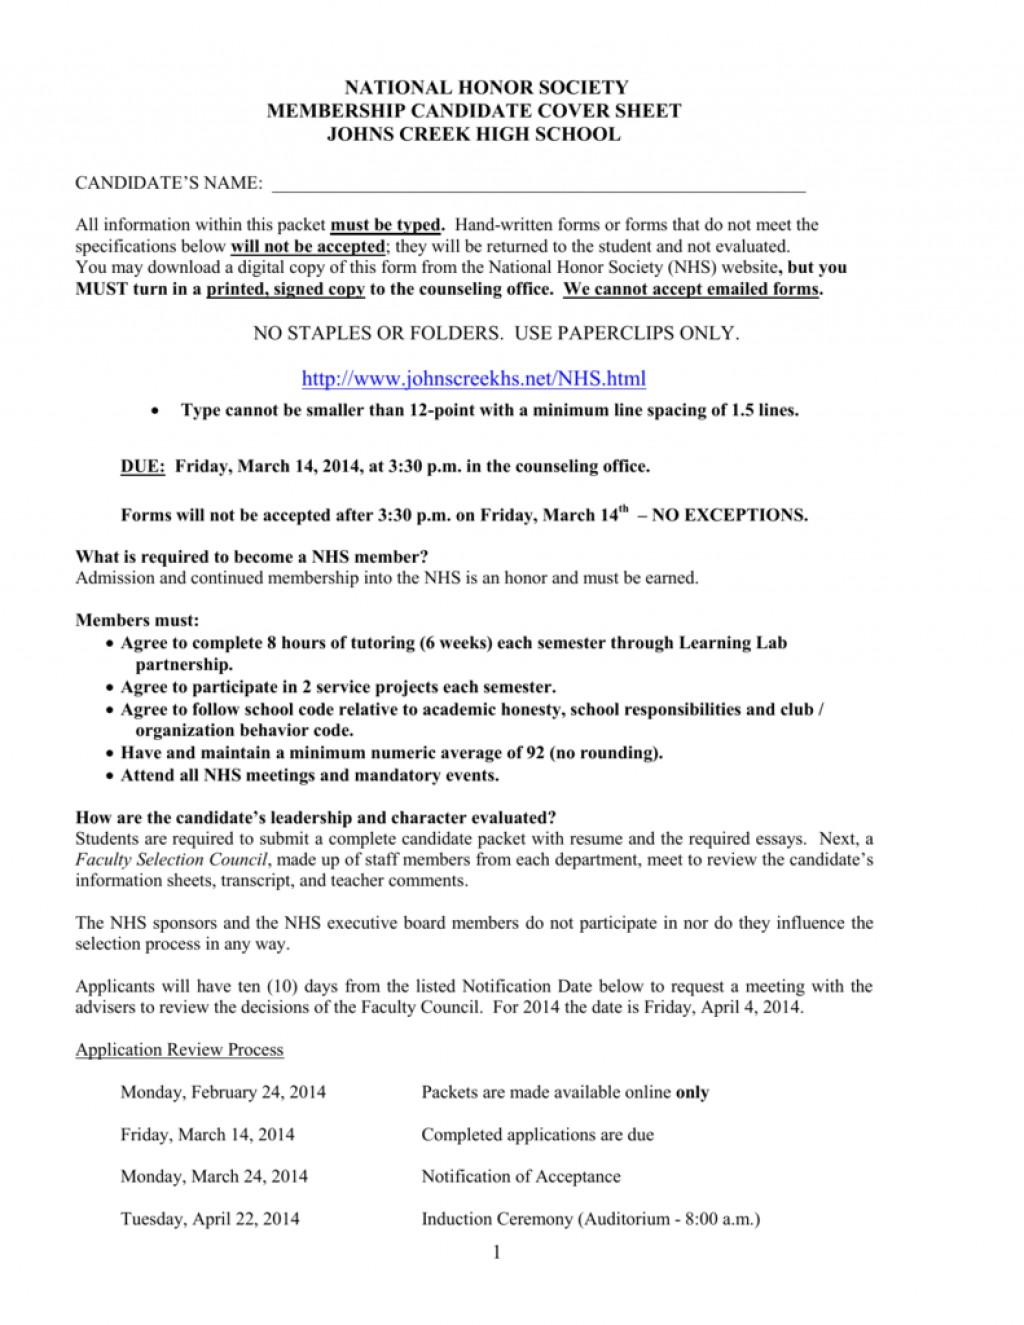 015 National Honor Society Application Essay 008823851 1 Sensational Junior Ideas Examples Large